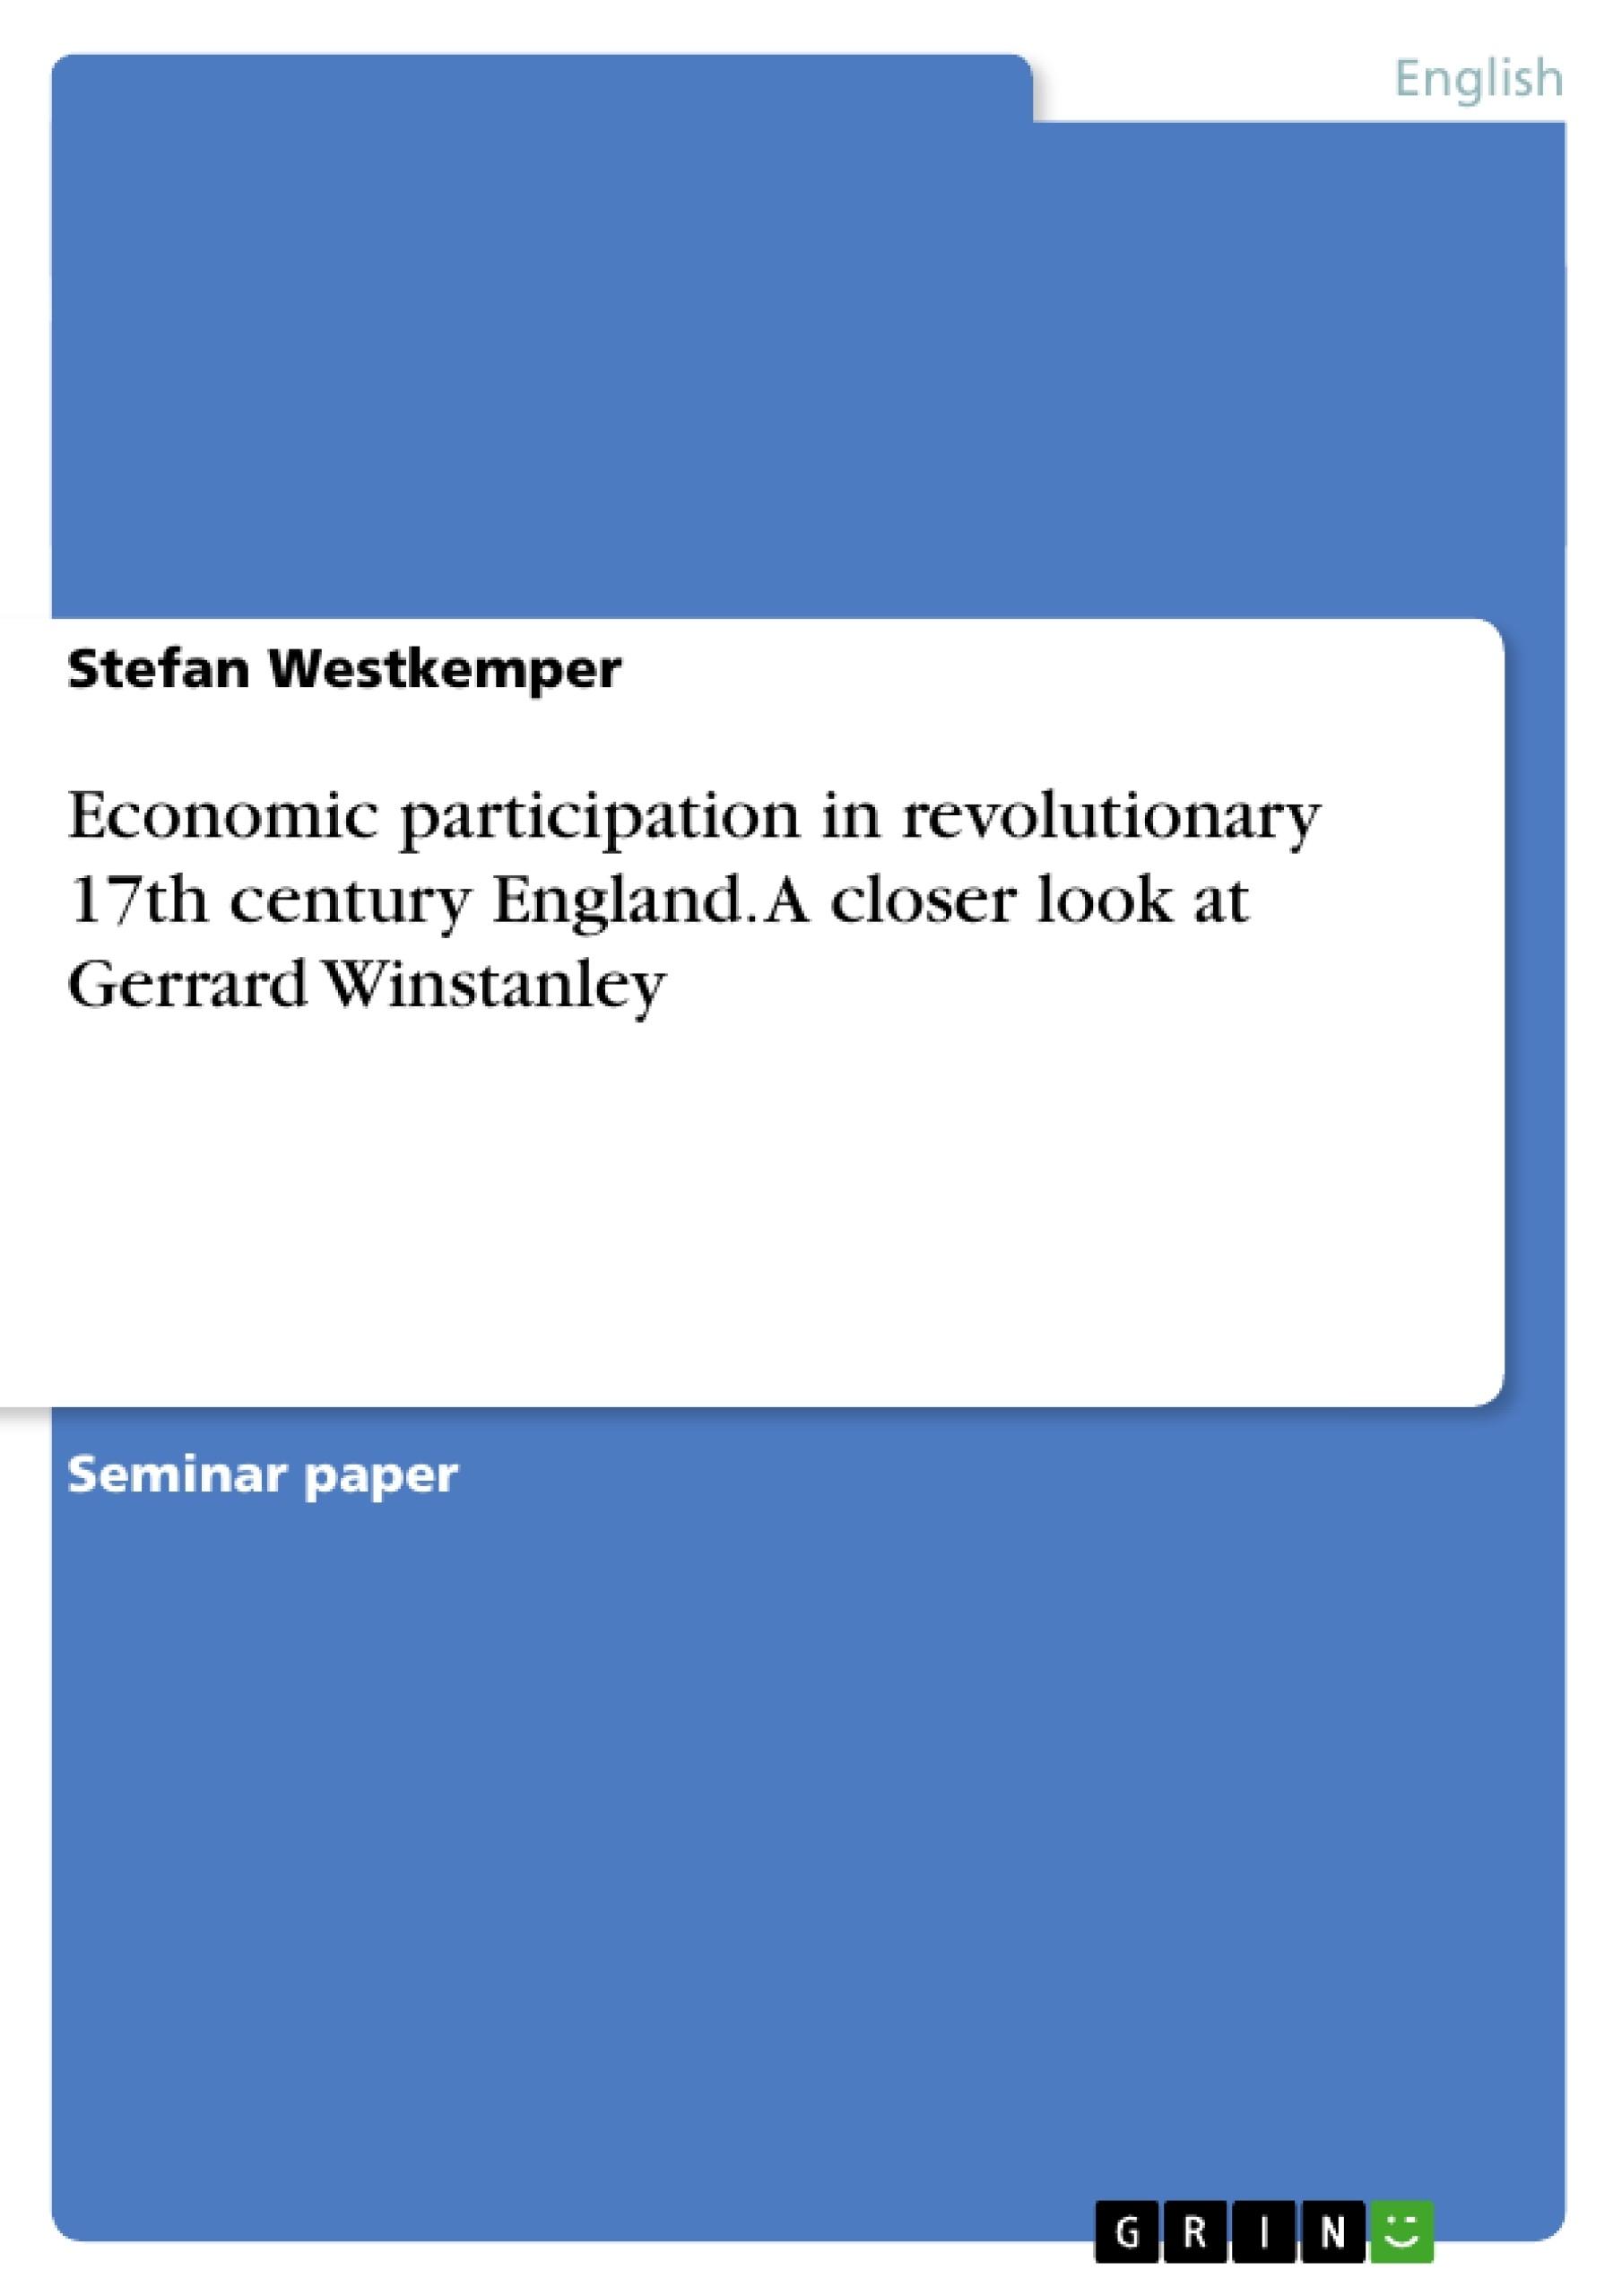 Title: Economic participation in revolutionary 17th century England. A closer look at Gerrard Winstanley